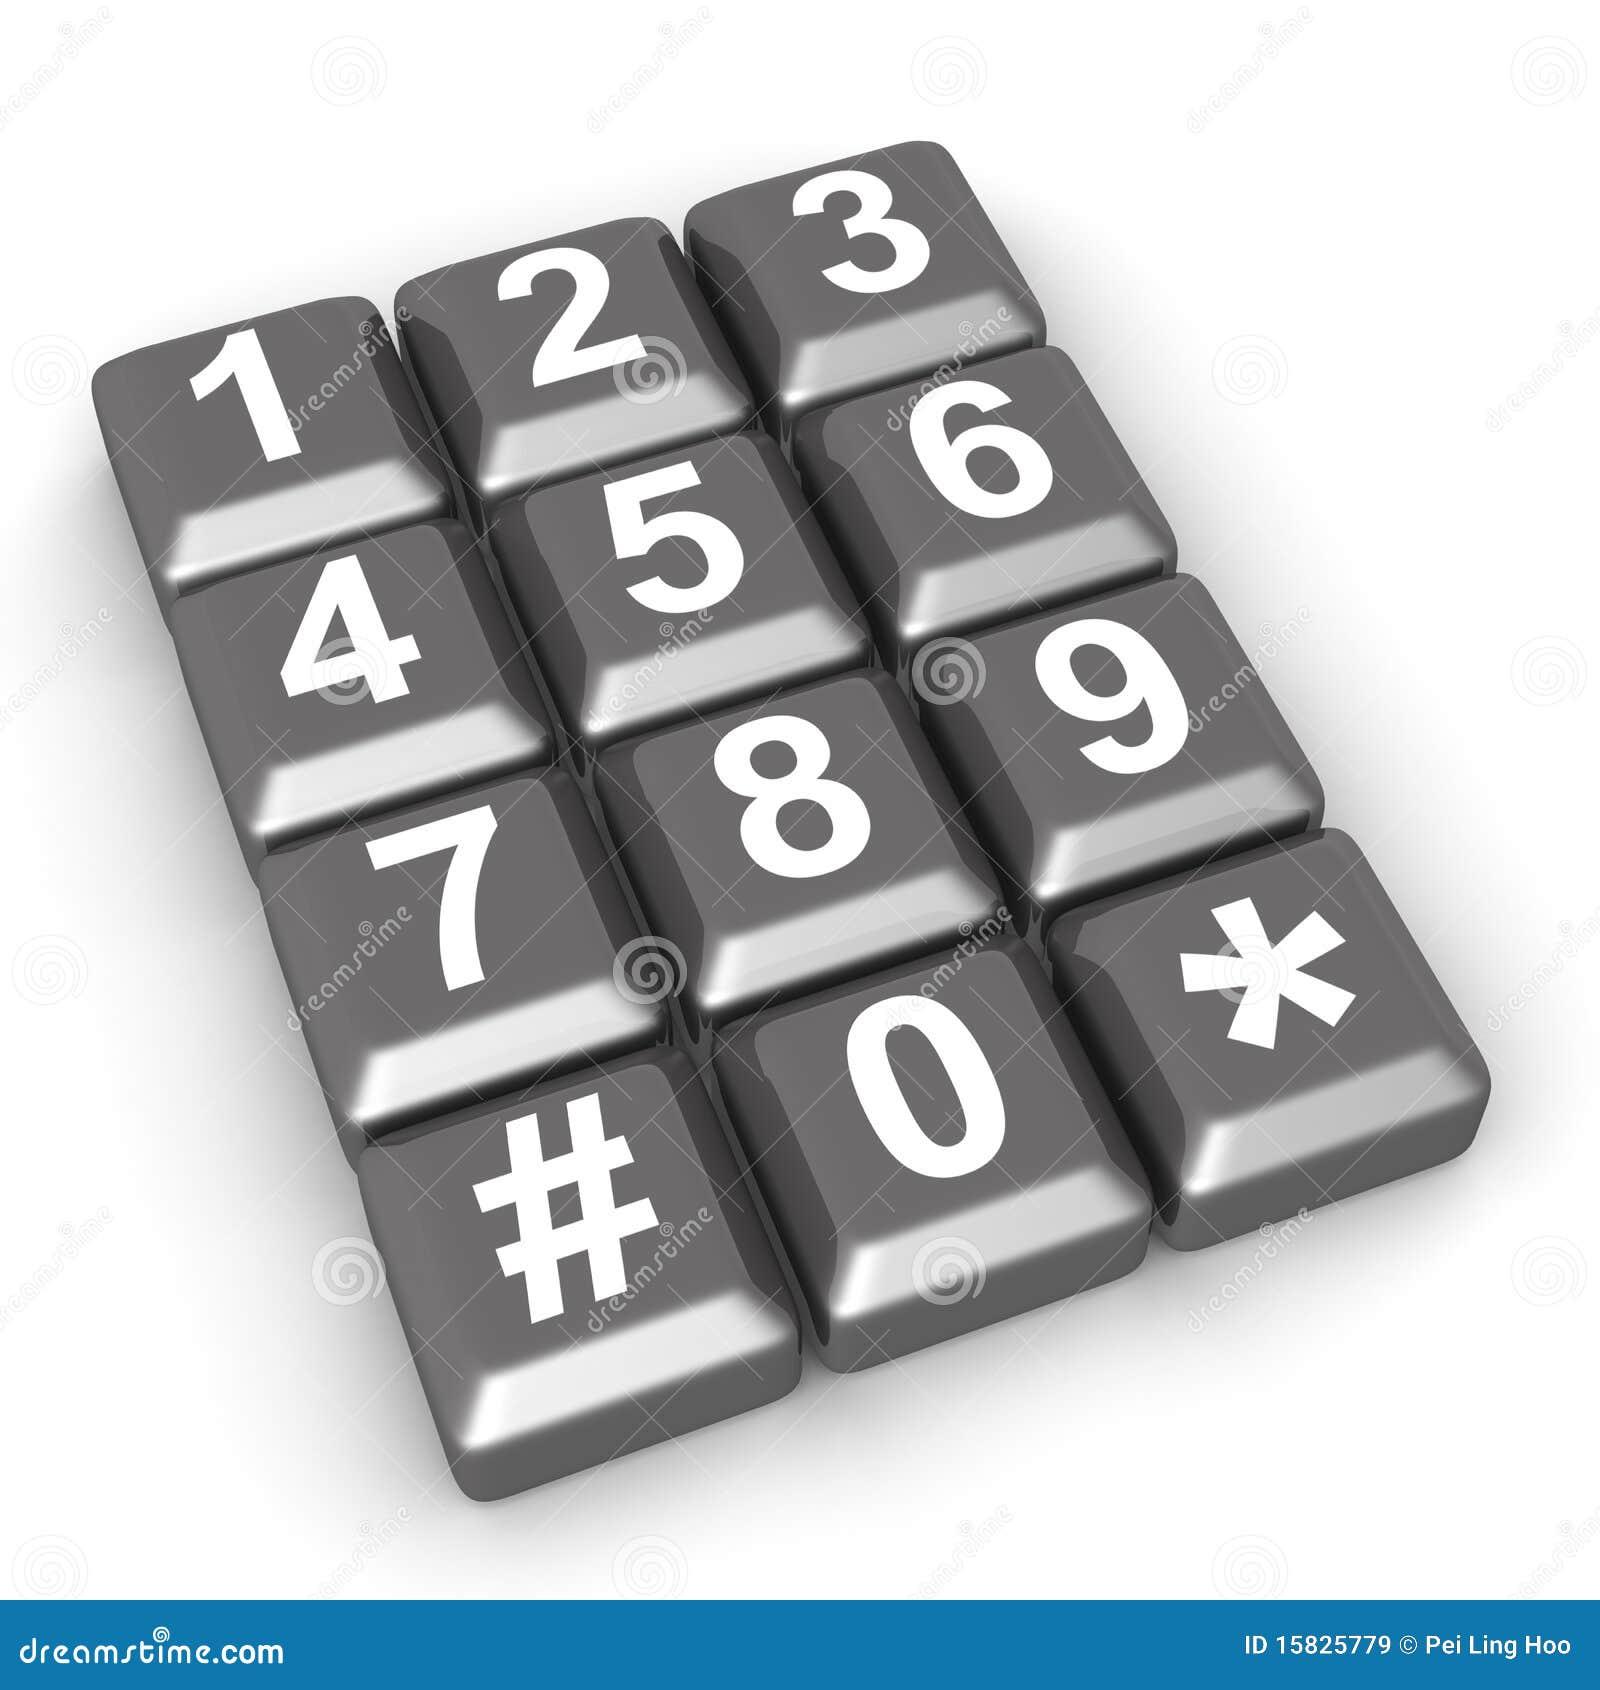 Concepto de la telecomunicación o del contacto